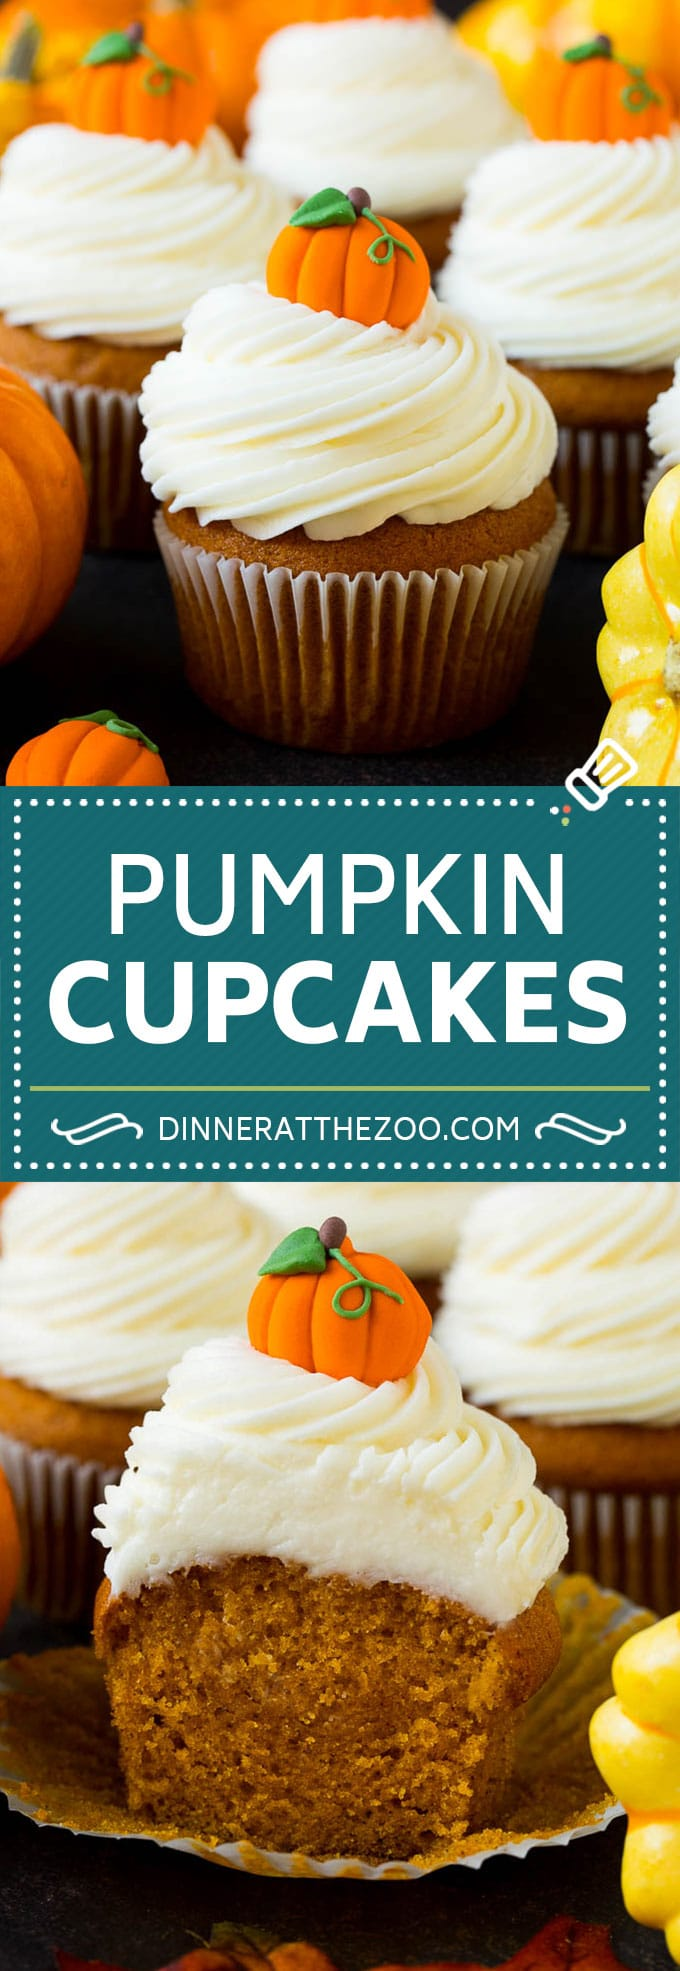 Pumpkin Cupcakes Recipe | Pumpkin Cake #cake #cupcakes #pumpkin #frosting #baking #fall #thanksgiving #dinneratthezoo